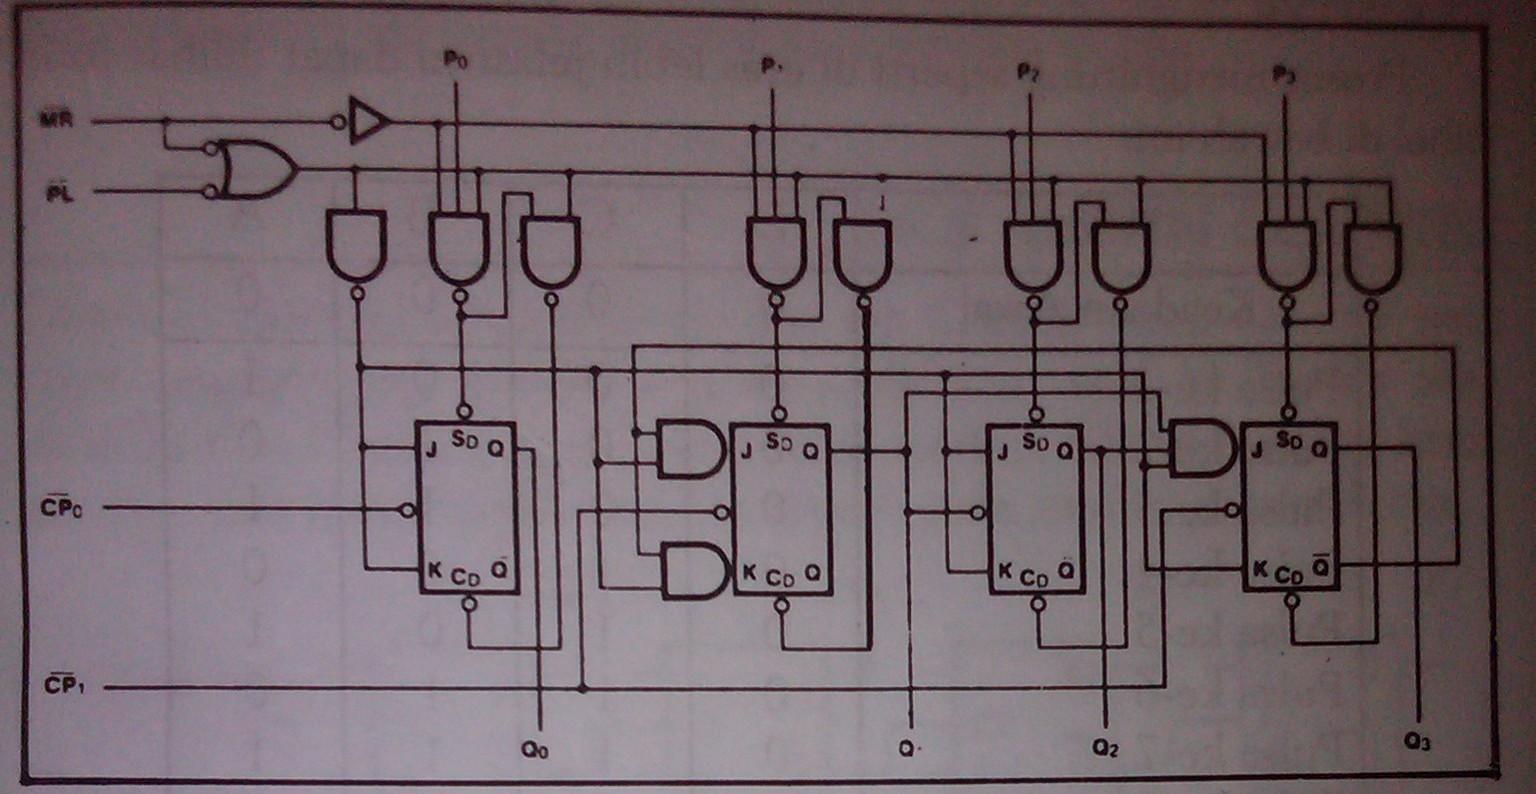 Rangkaian Counterpenghitung Electro 4 Bit Counter Logic Diagram Binary Waktu Dari